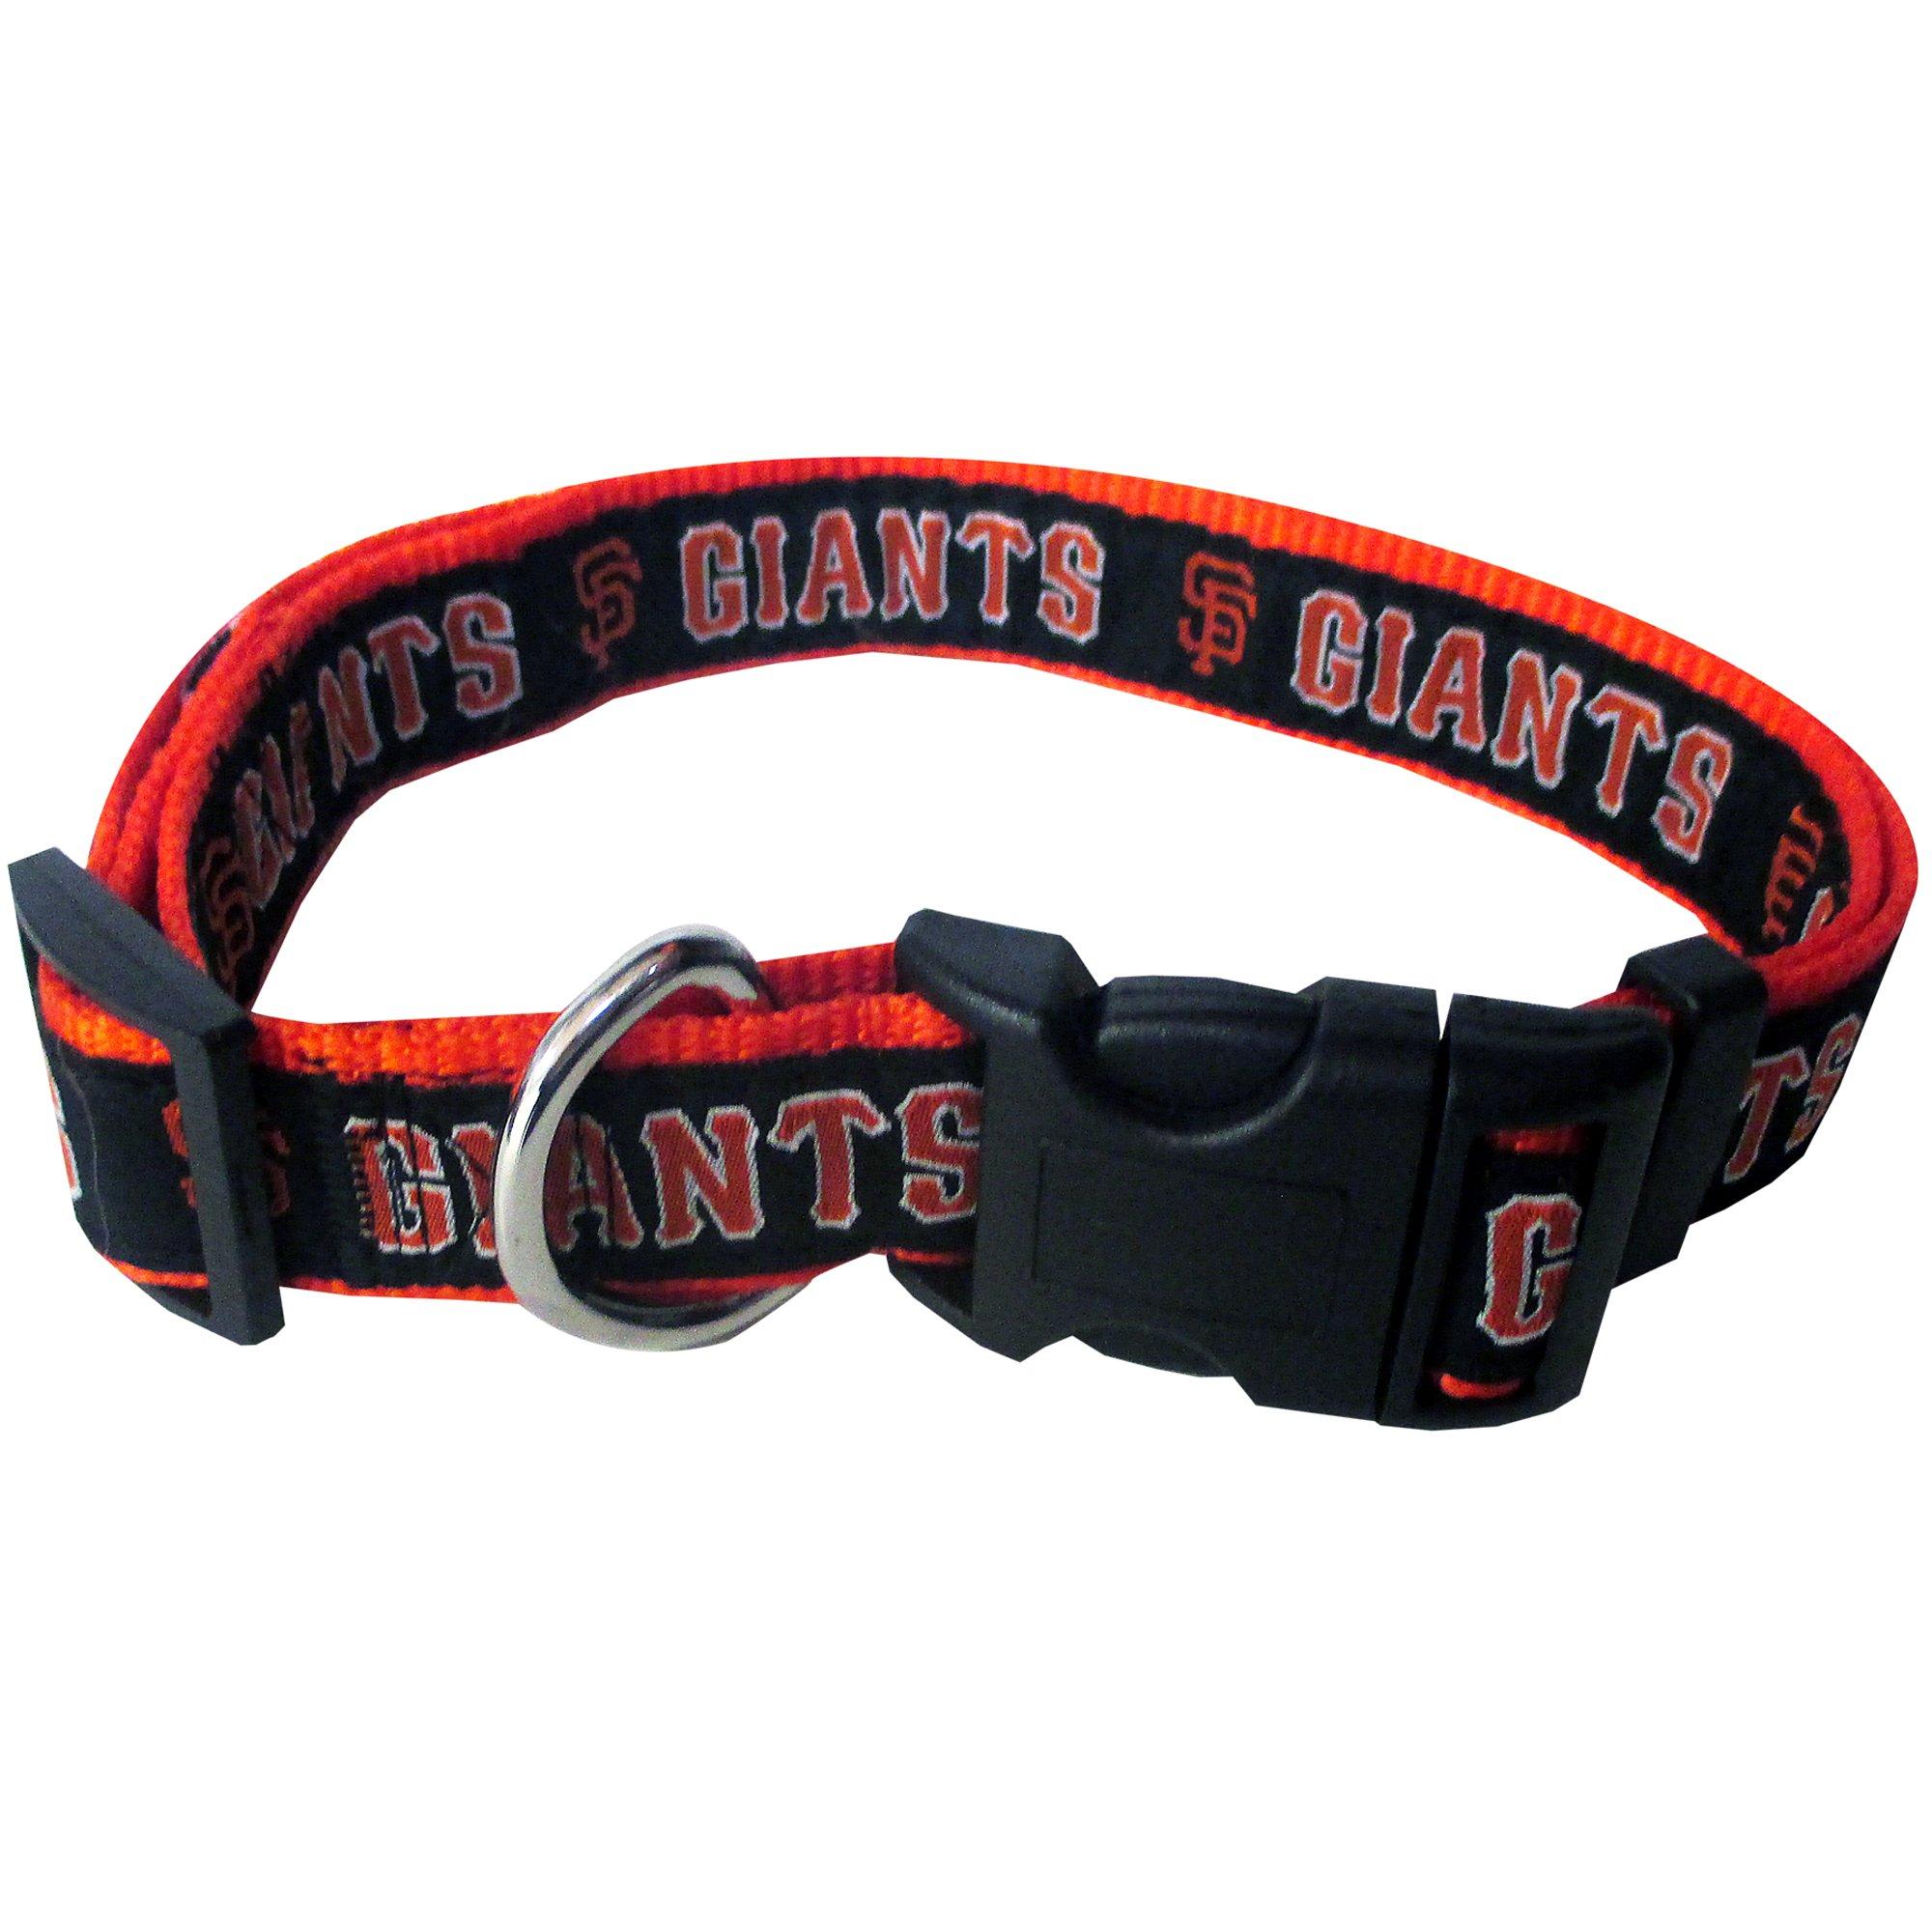 UPC 849790017160 - Pets First San Francisco Giants Collar 9589d0d53